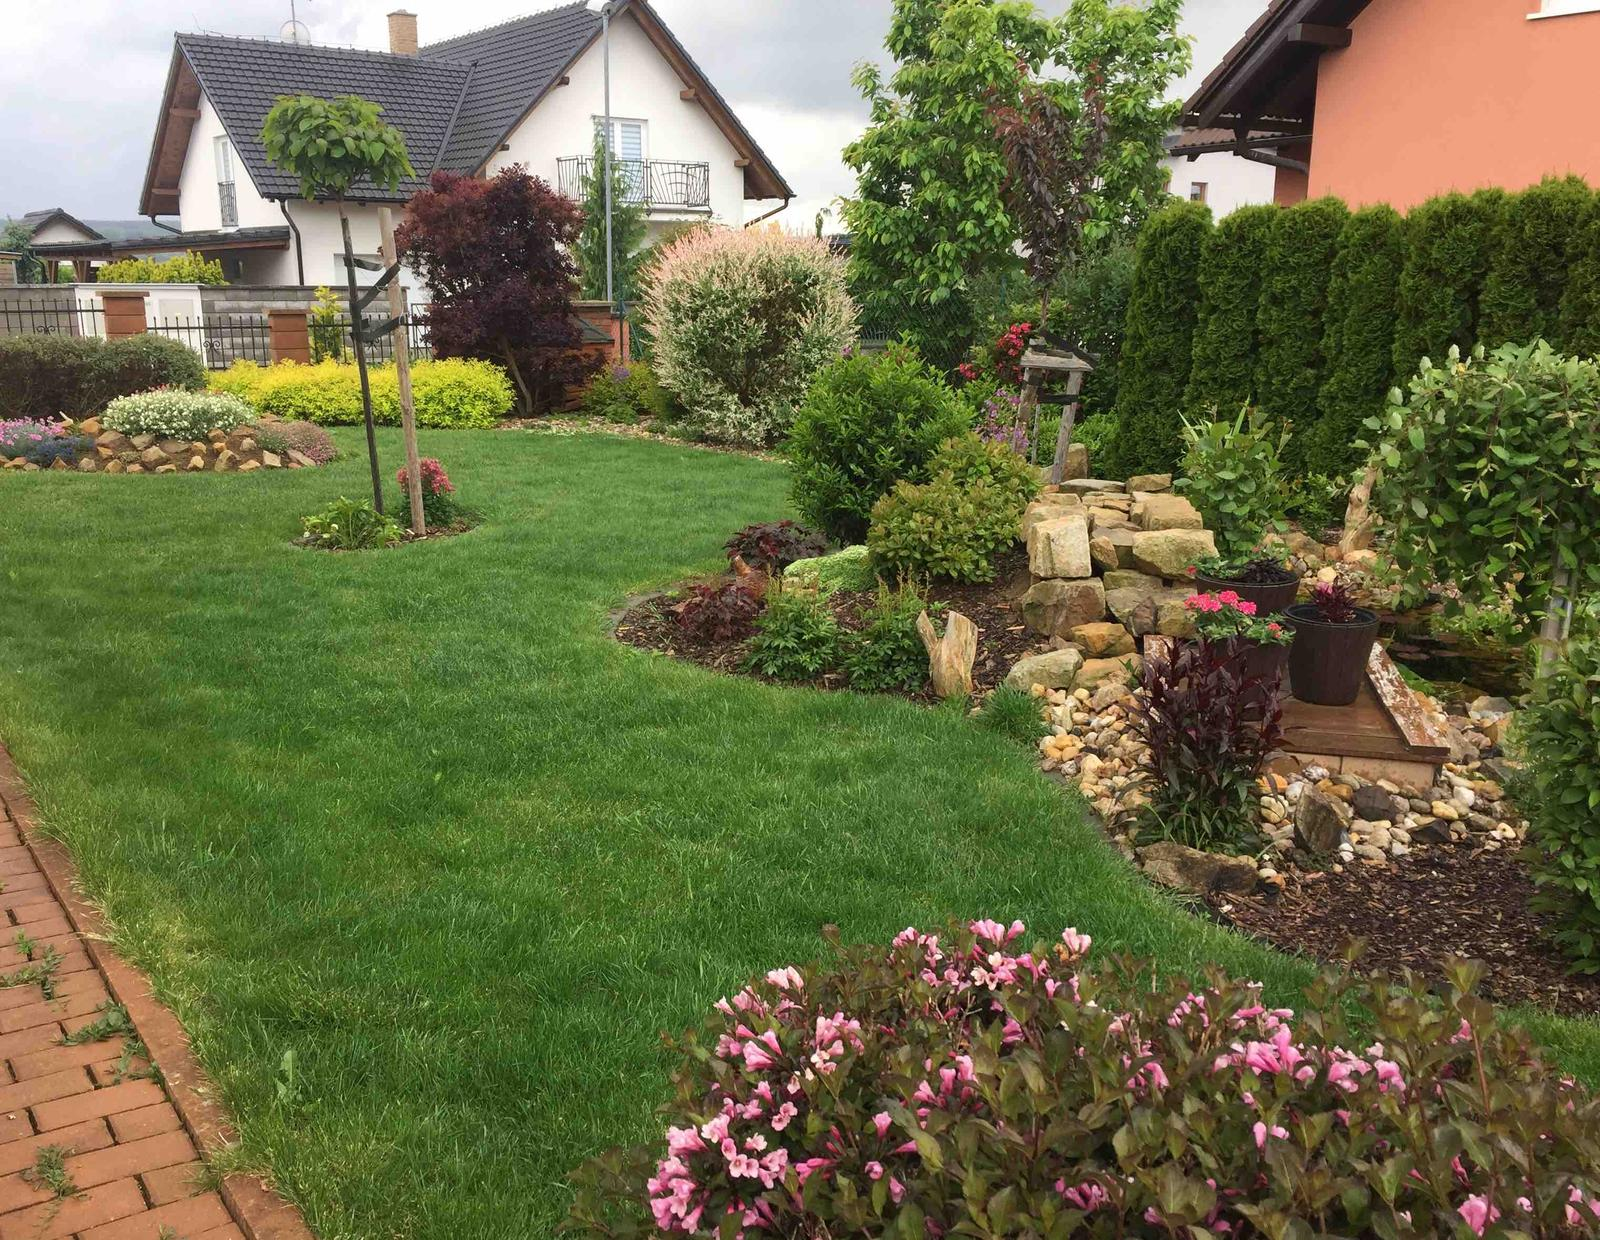 Naše barevná zahrada 🌸 rok 2020 - Zahrada po dešti-tráva roste před očima 🤗